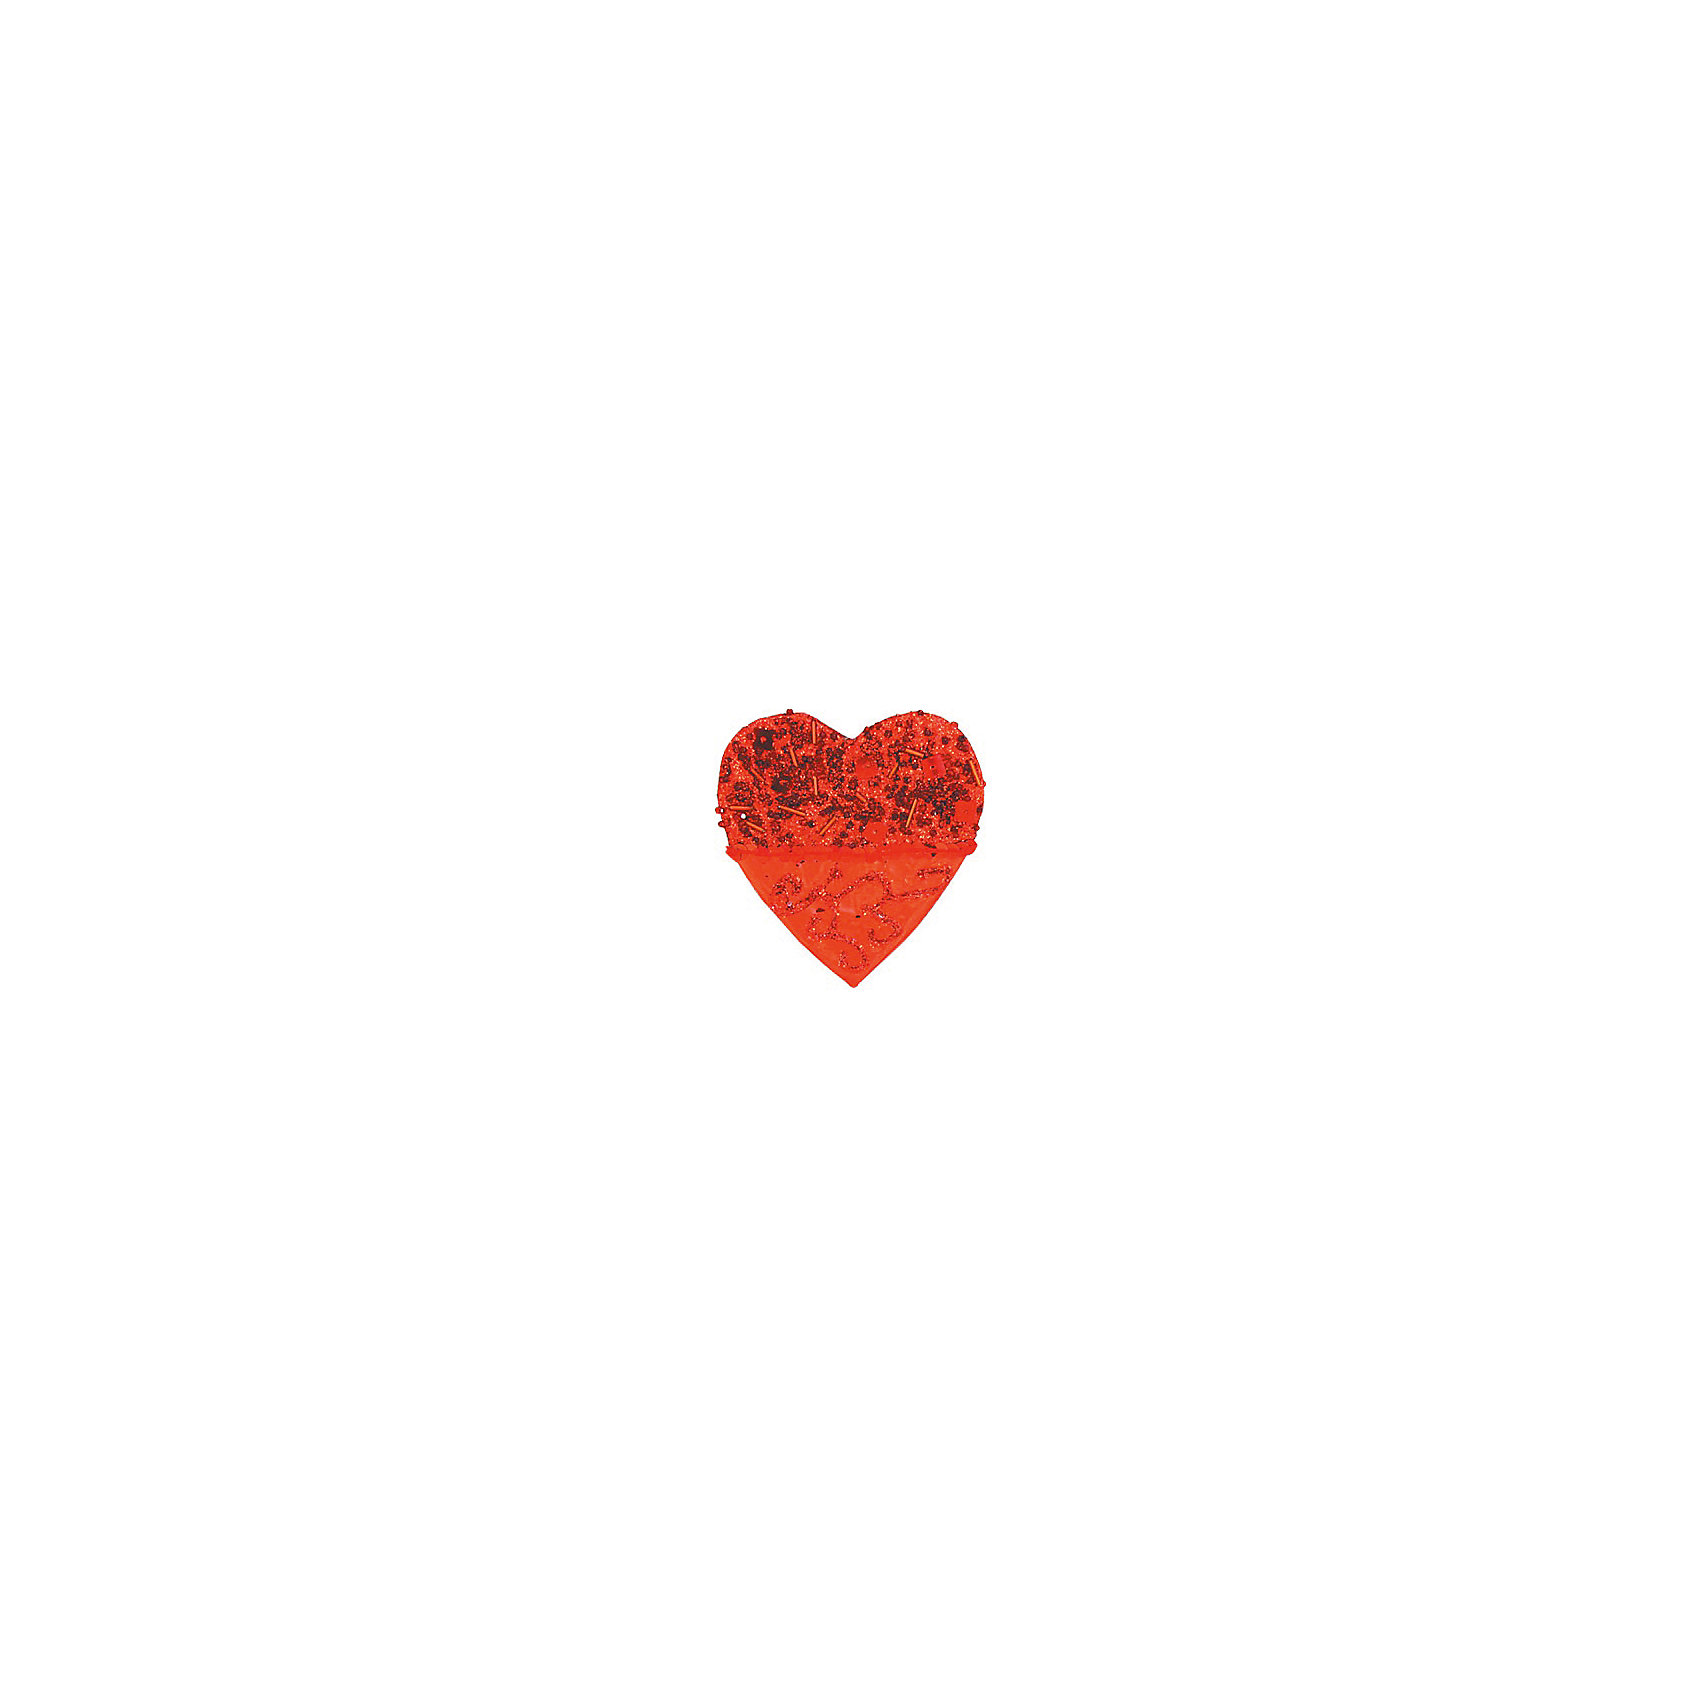 Marko Ferenzo Красное украшение Сердце 10 см